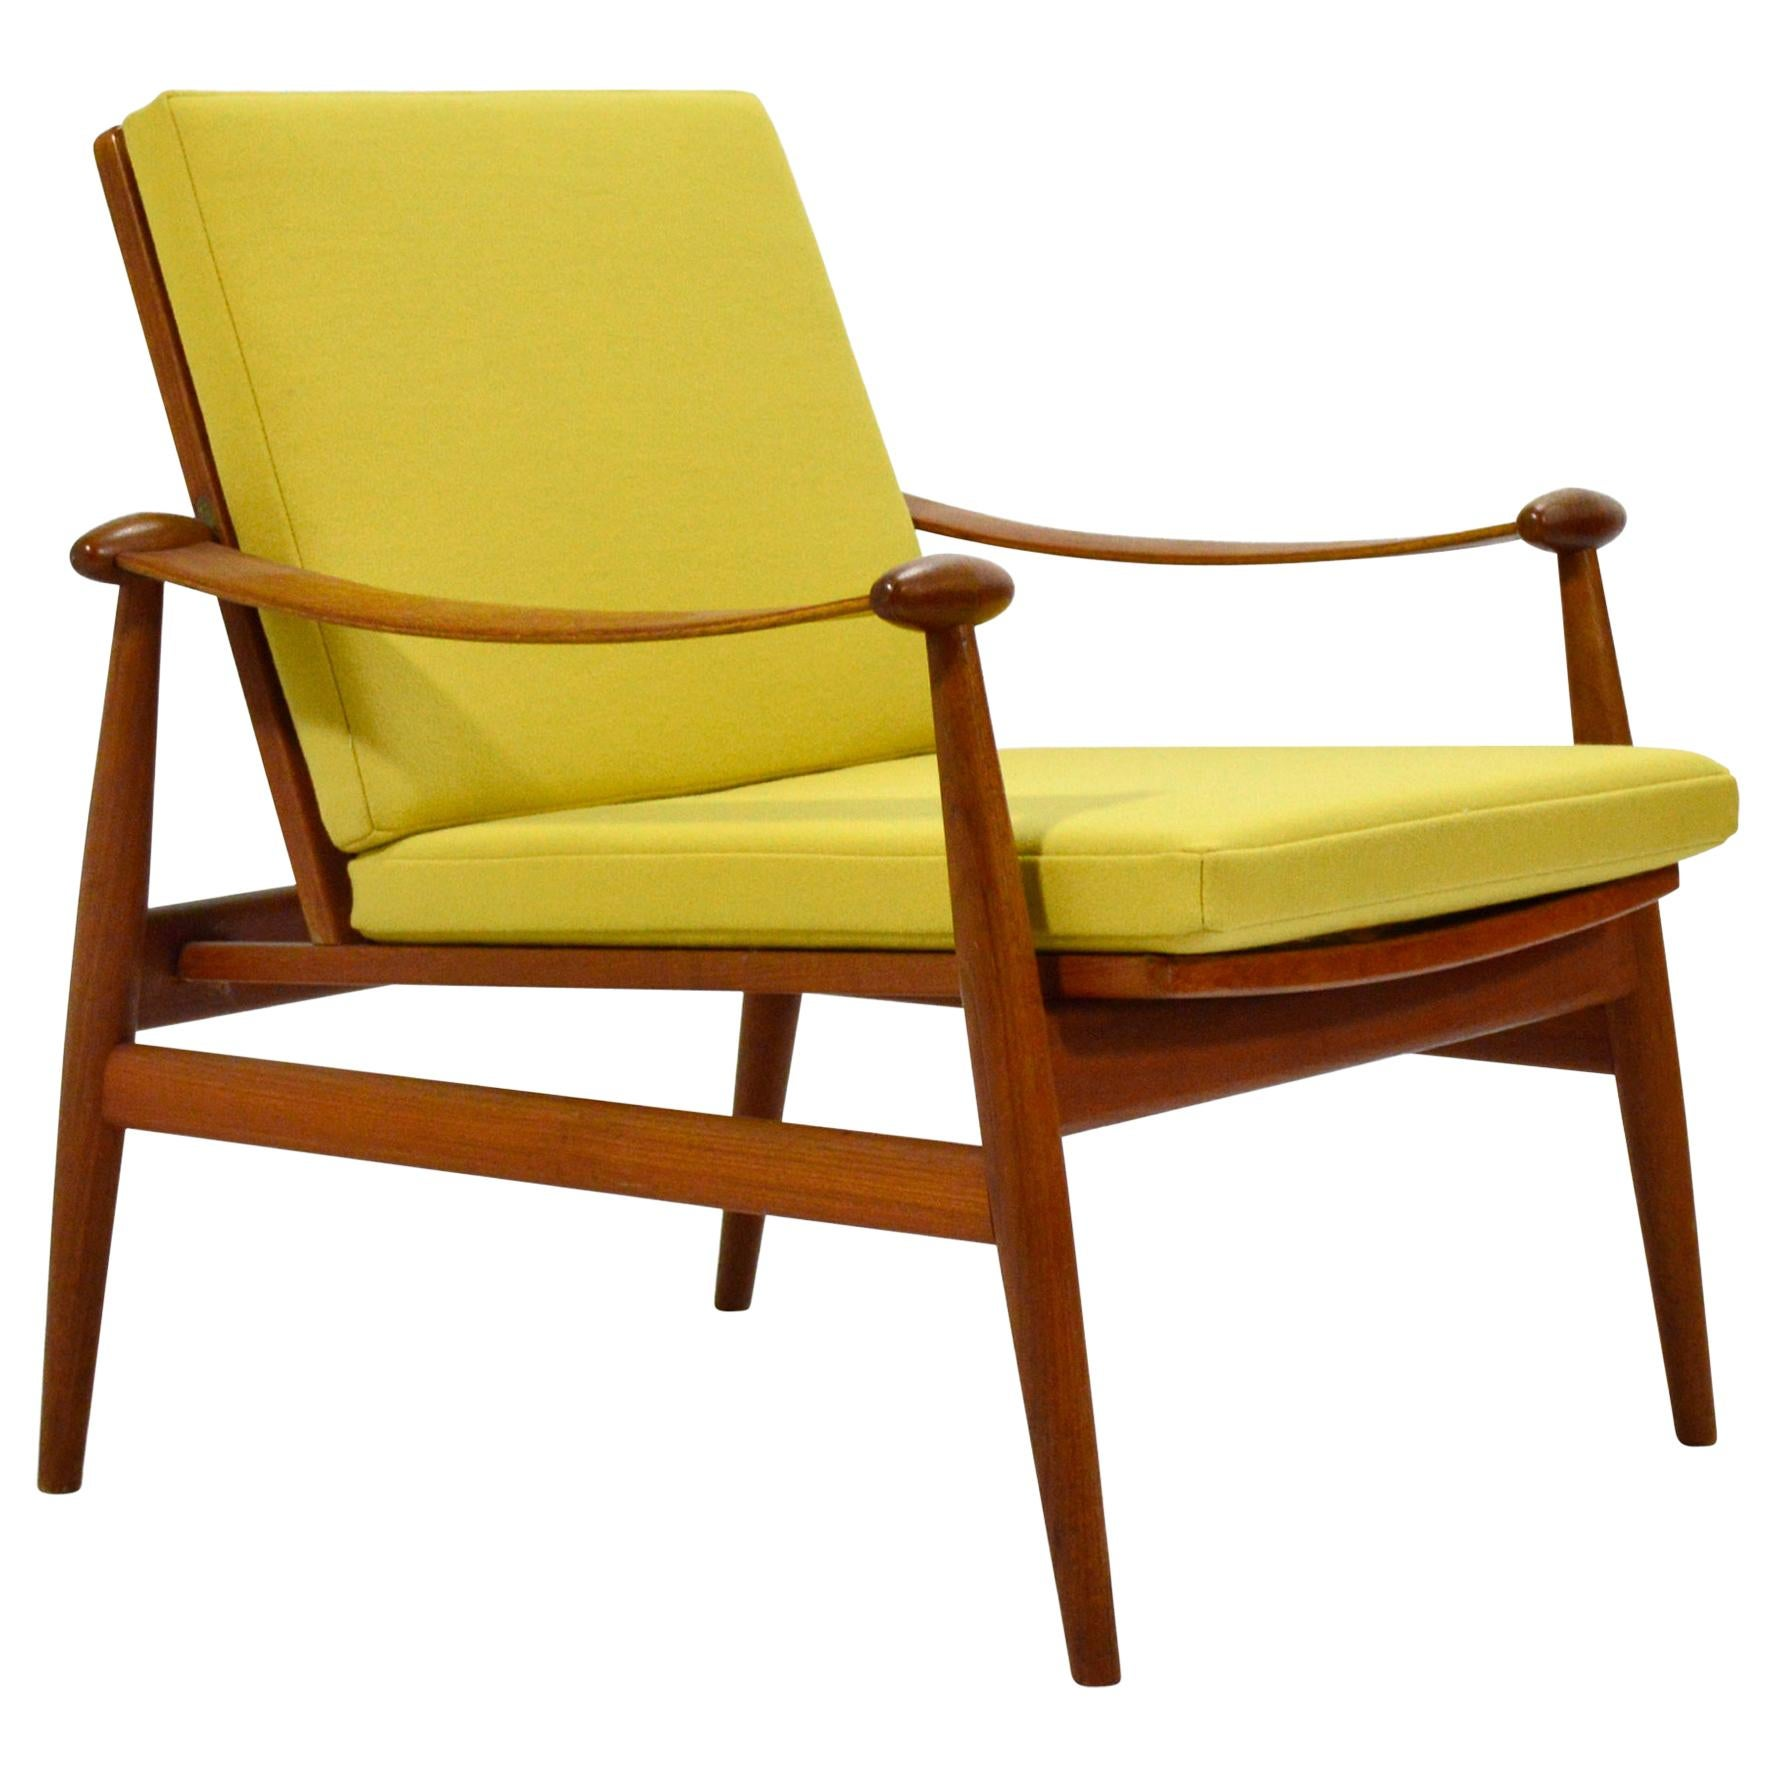 "Finn Juhl Model 133 ""Spade"" Lounge Chair by France & Daverkosen"